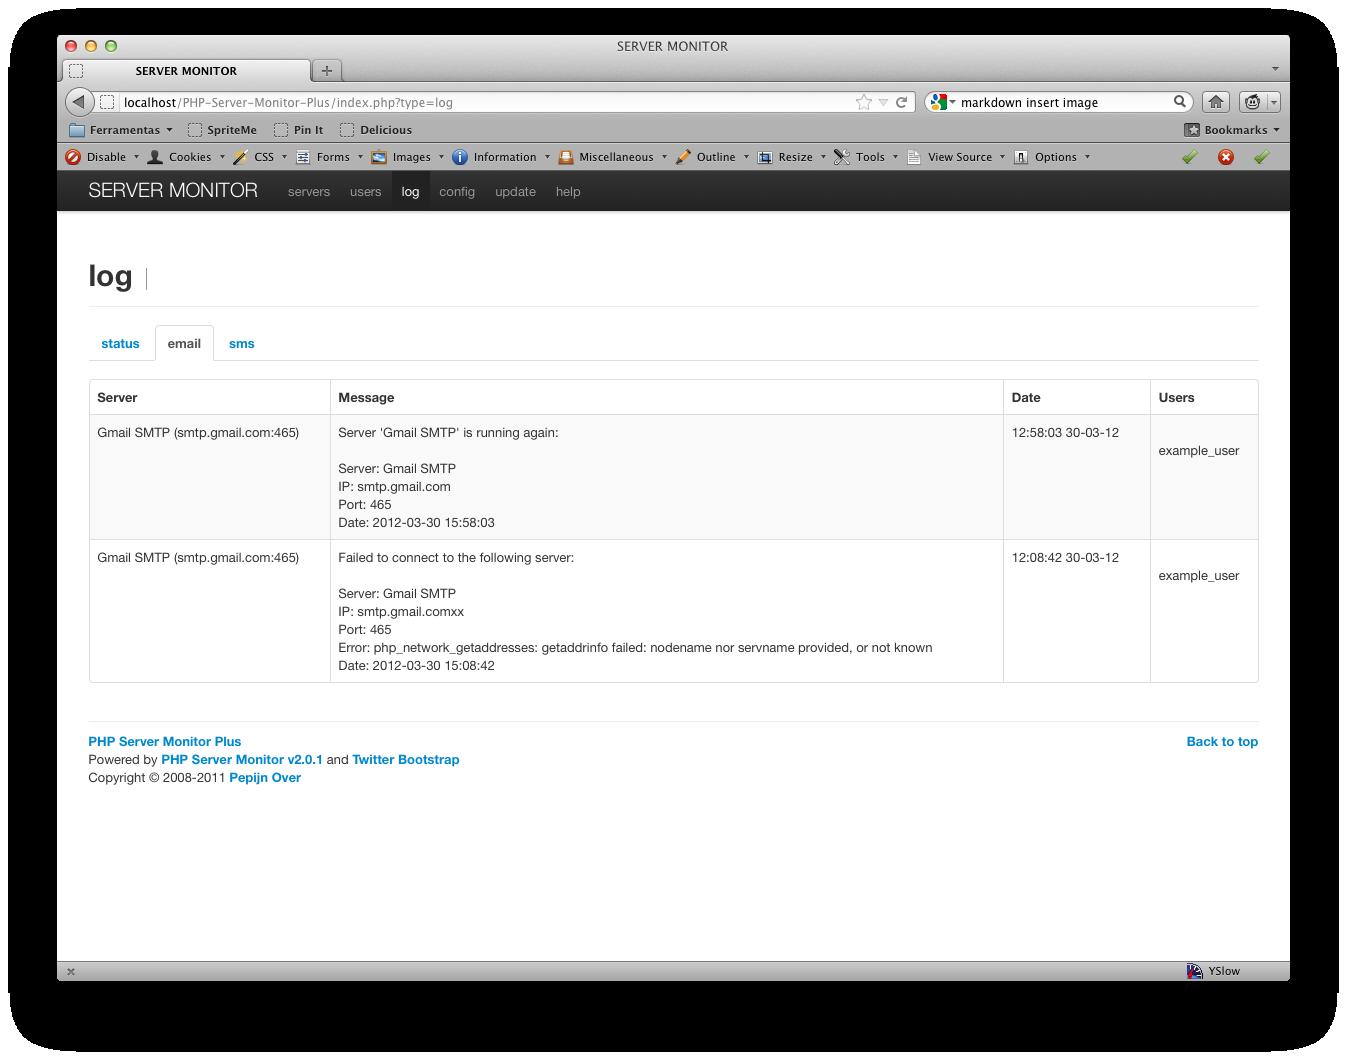 Email Log List